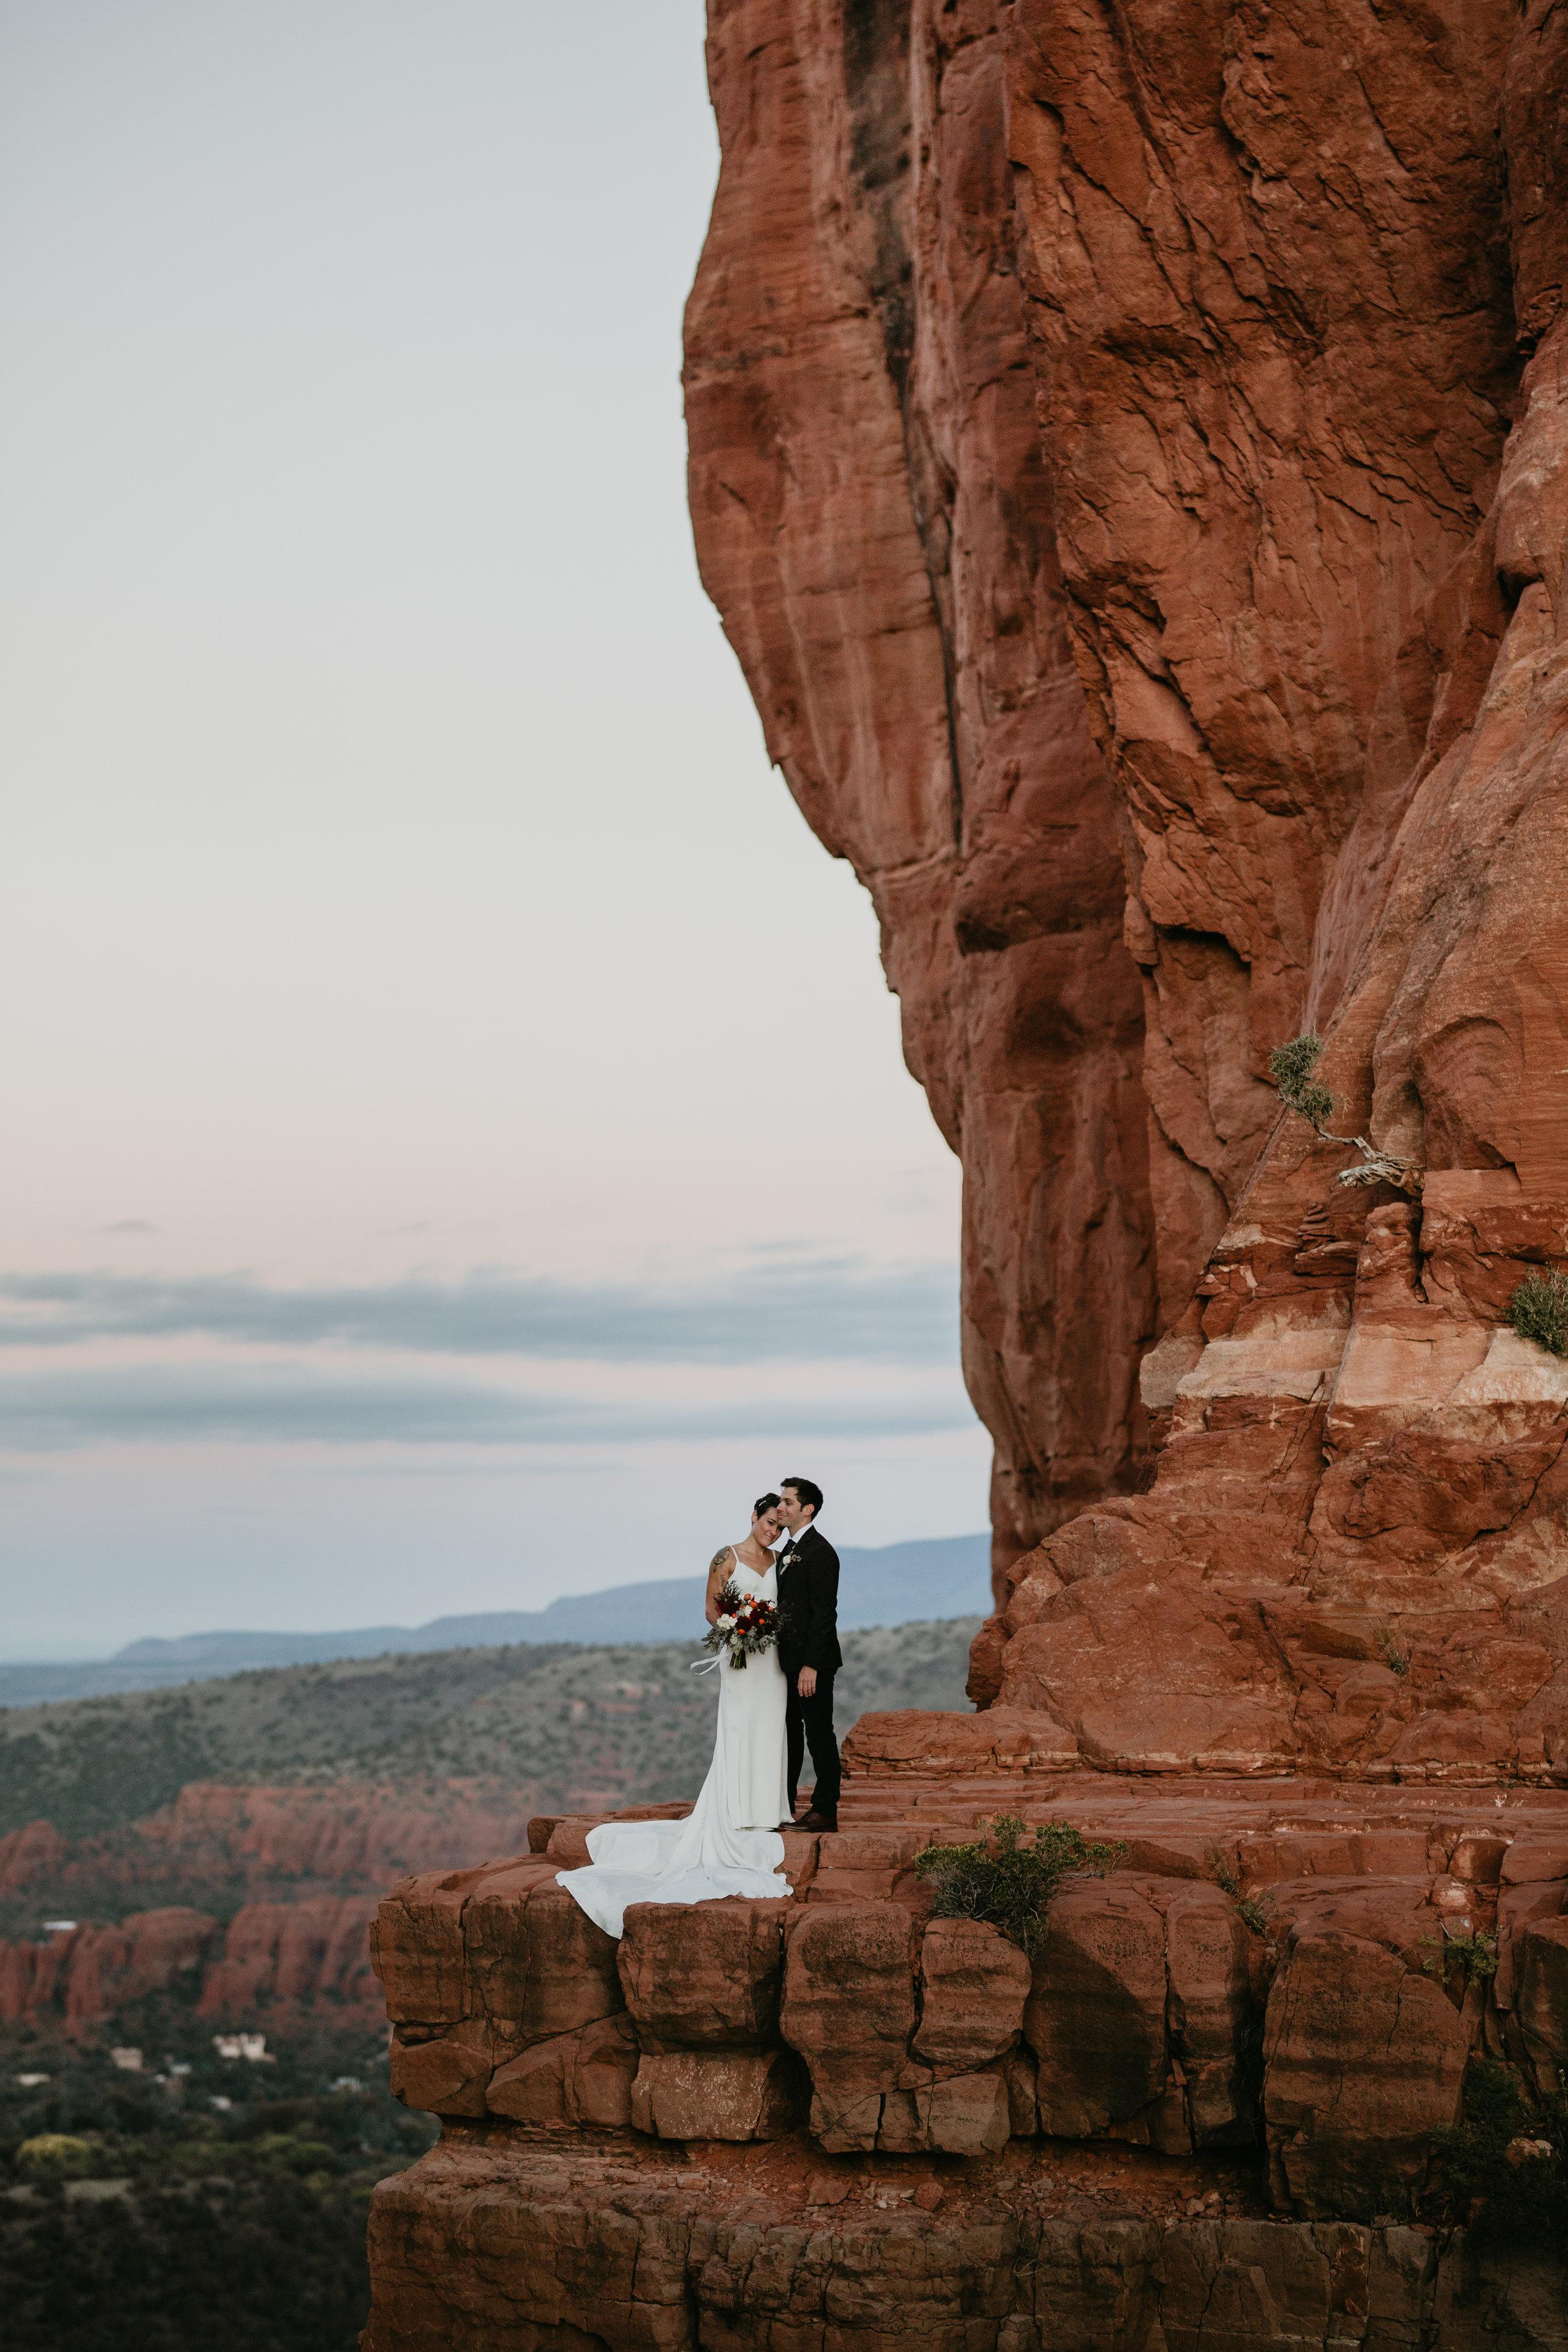 nicole-daacke-photography-sedona-arizona-destination-elopement-wedding-photographer-catherdral-rock-hiking-elopement-sedona-river-elopement-photos-desert-rock-wedding-photographer-laid-back-spontaneous-elopement-23.jpg